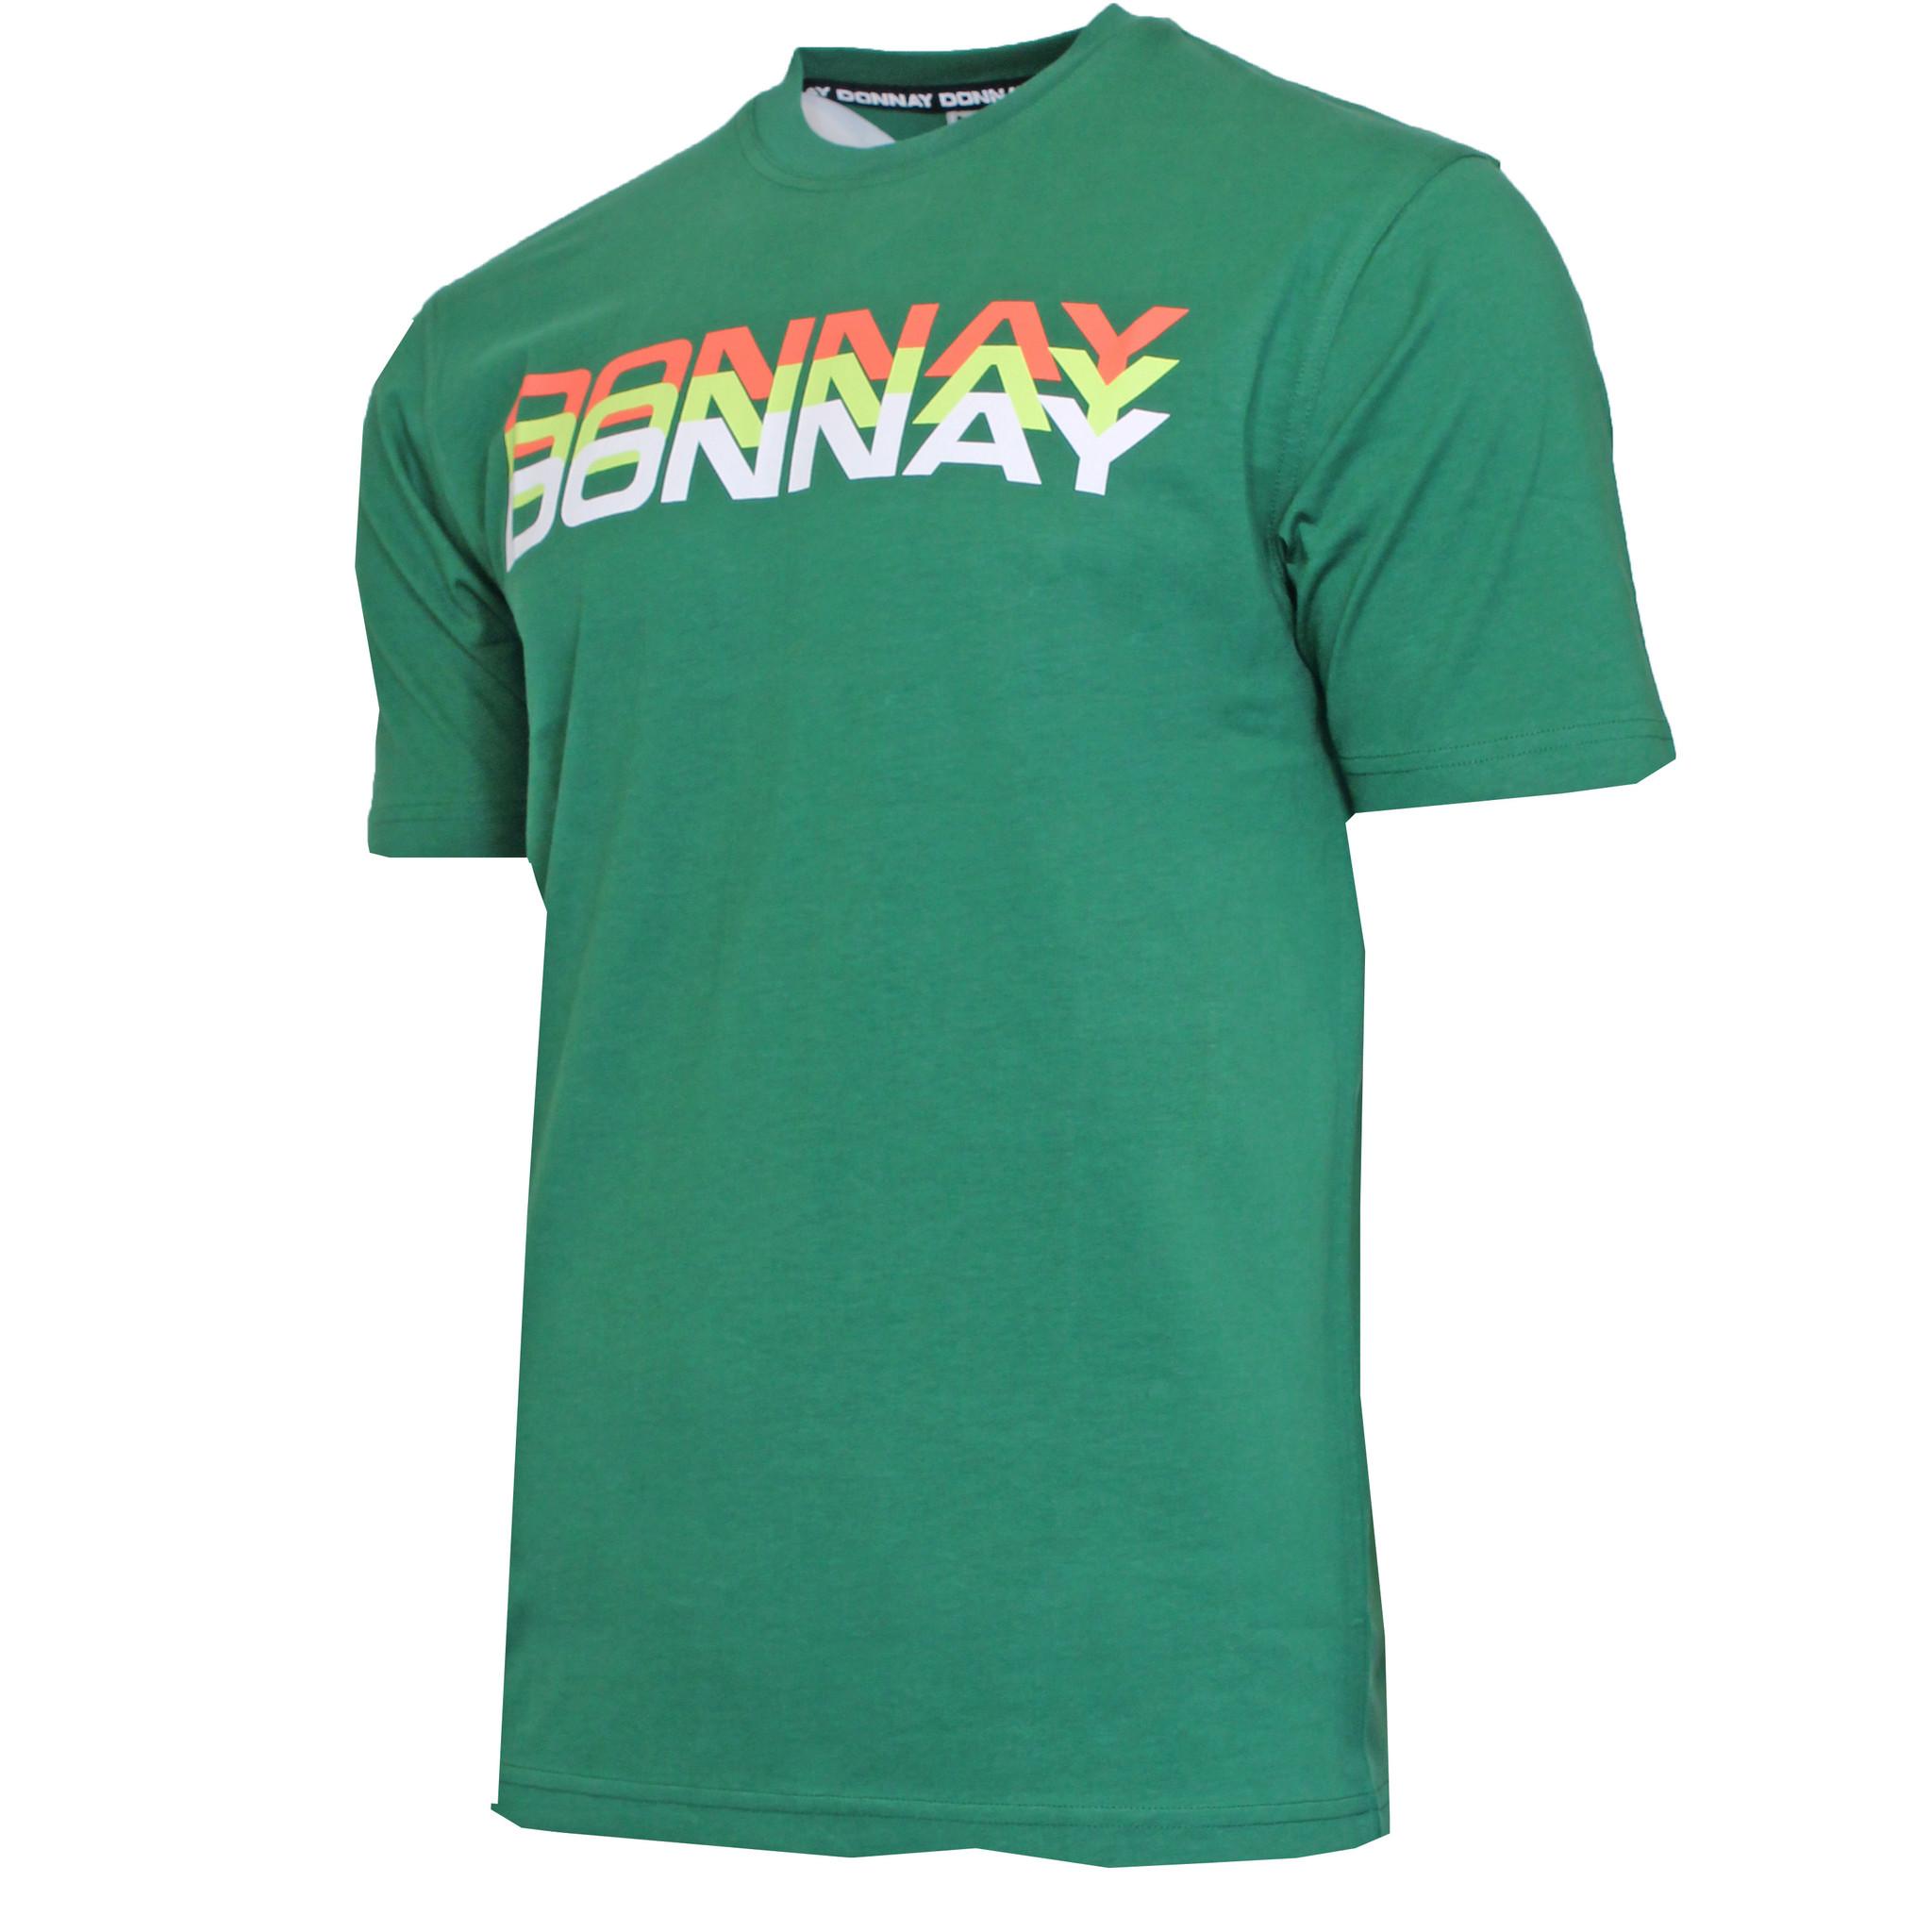 Donnay Donnay Heren - T-Shirt Daks - Bosgroen